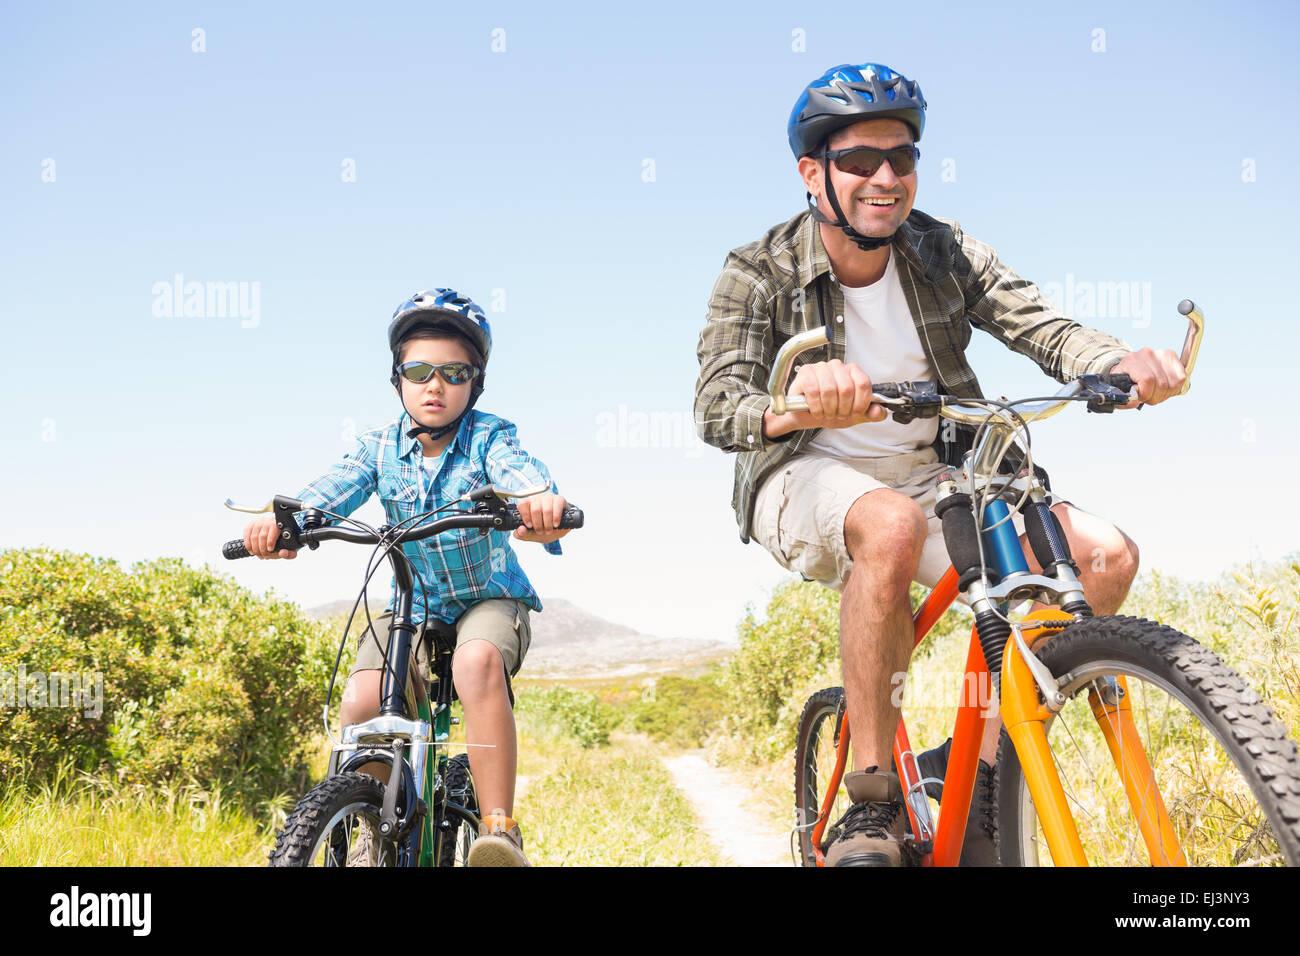 Padre e hijo en bicicleta a través de las montañas Imagen De Stock